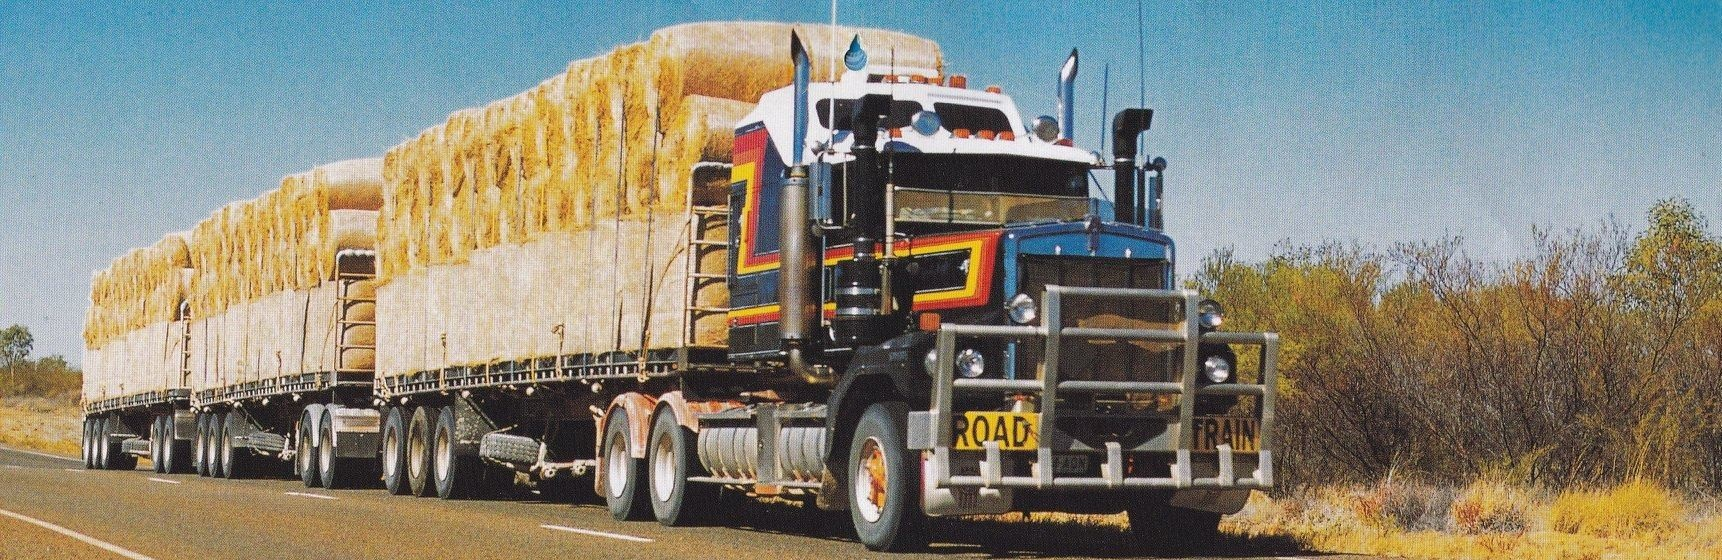 Kings-Forman-Archieve-Kenowrth-600-HP-Cumminns-triple-flat-traliler-Mount-Isa-Queensland--2